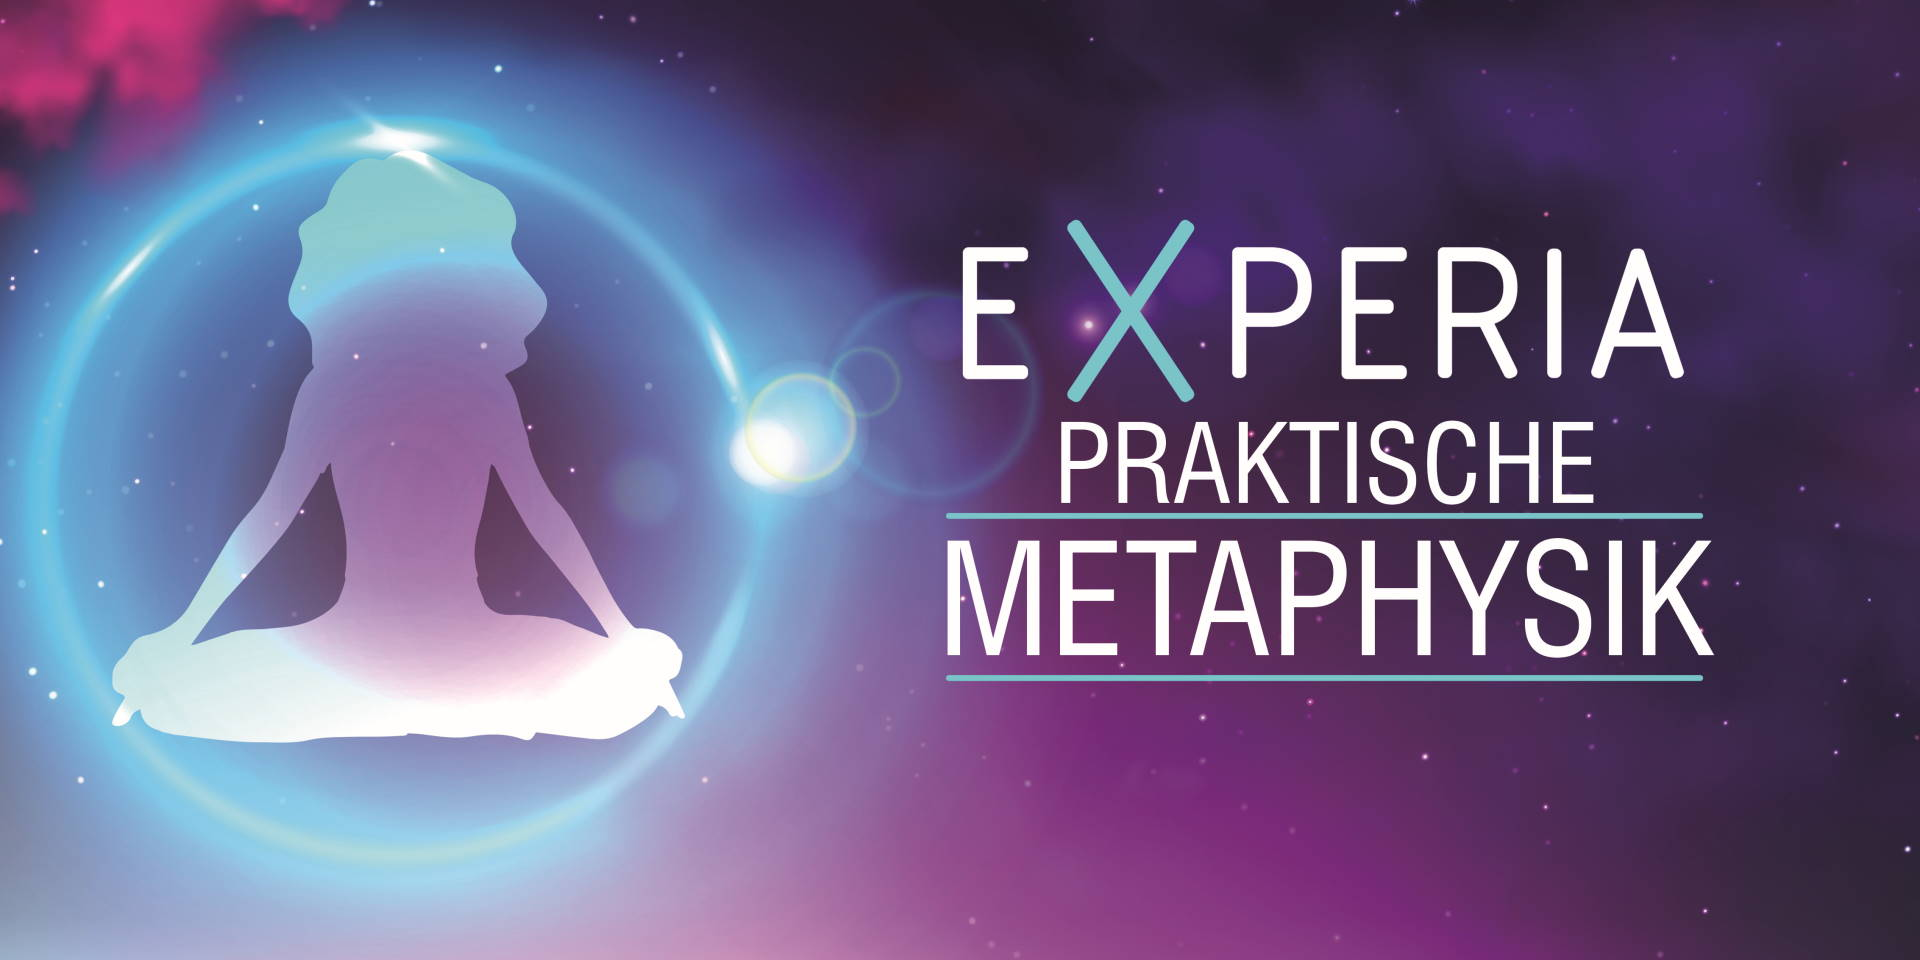 Eventreihe - eXperia - praktische Metaphysik